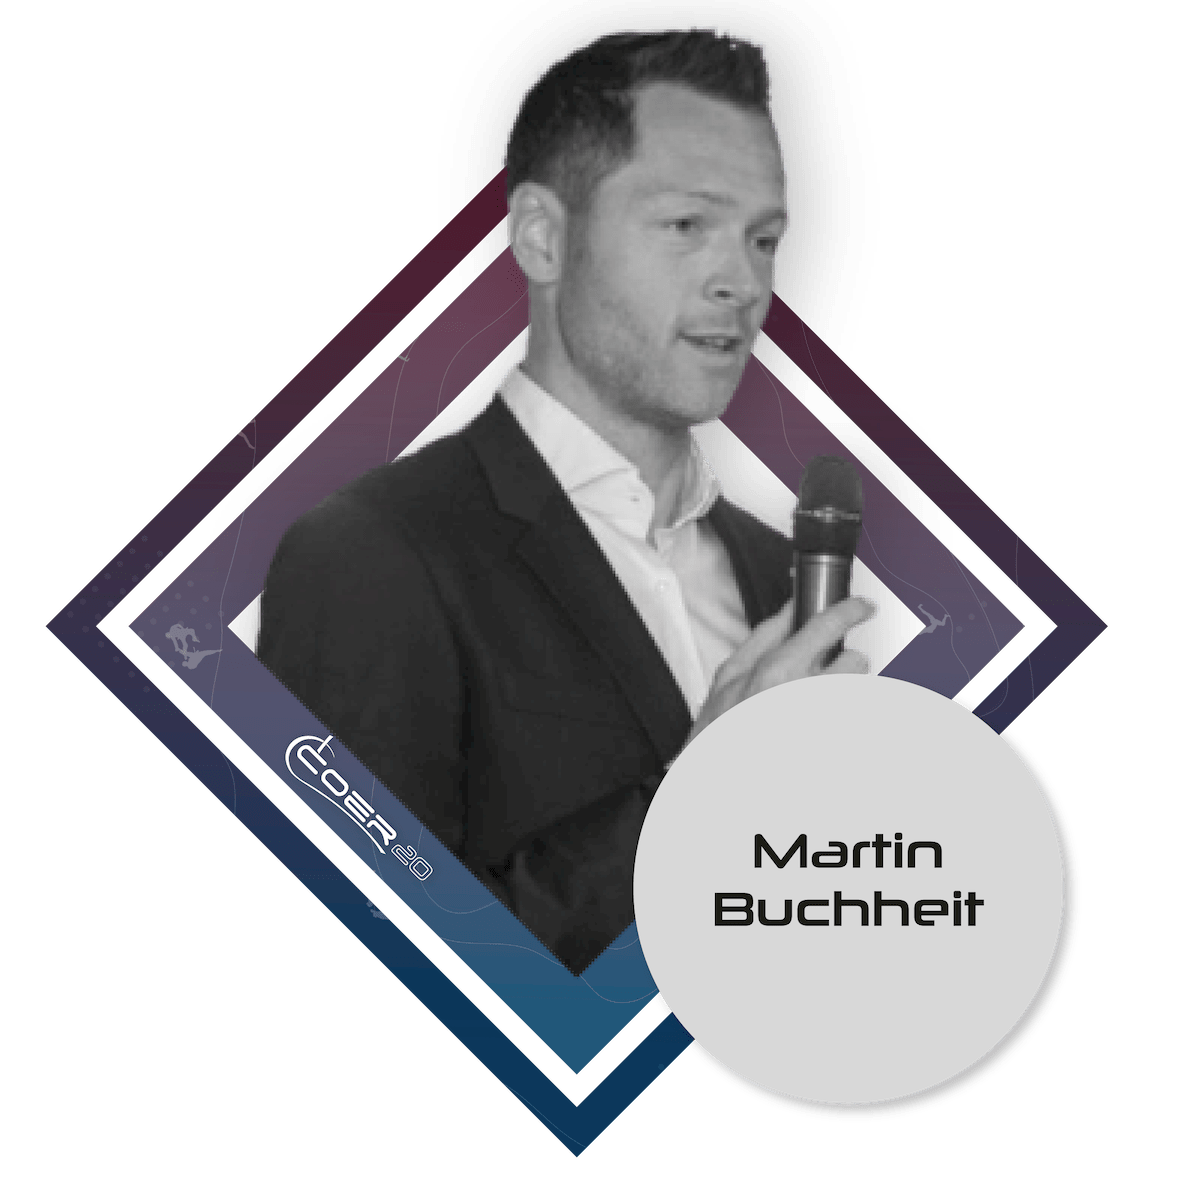 Martin Buchheit